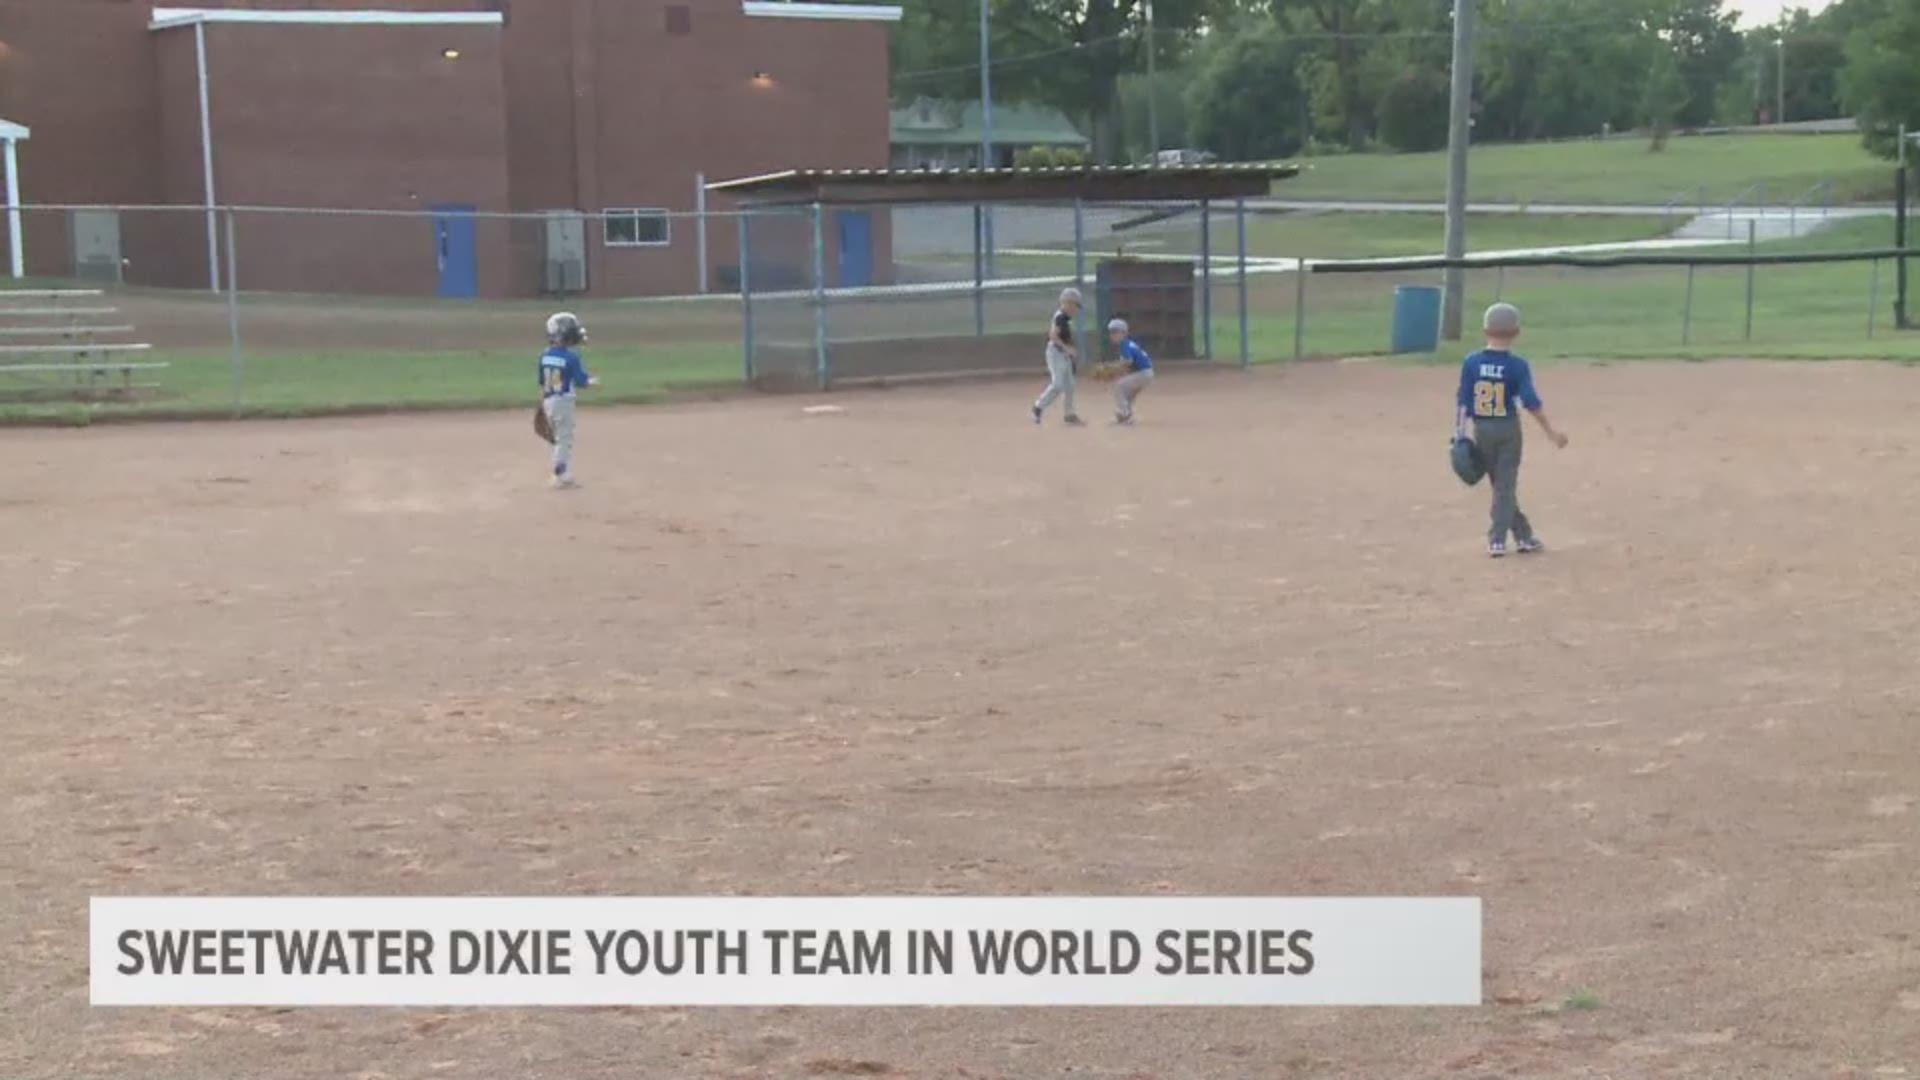 Sweetwater Dixie Youth Baseball Team Wins World Series Wbir Com